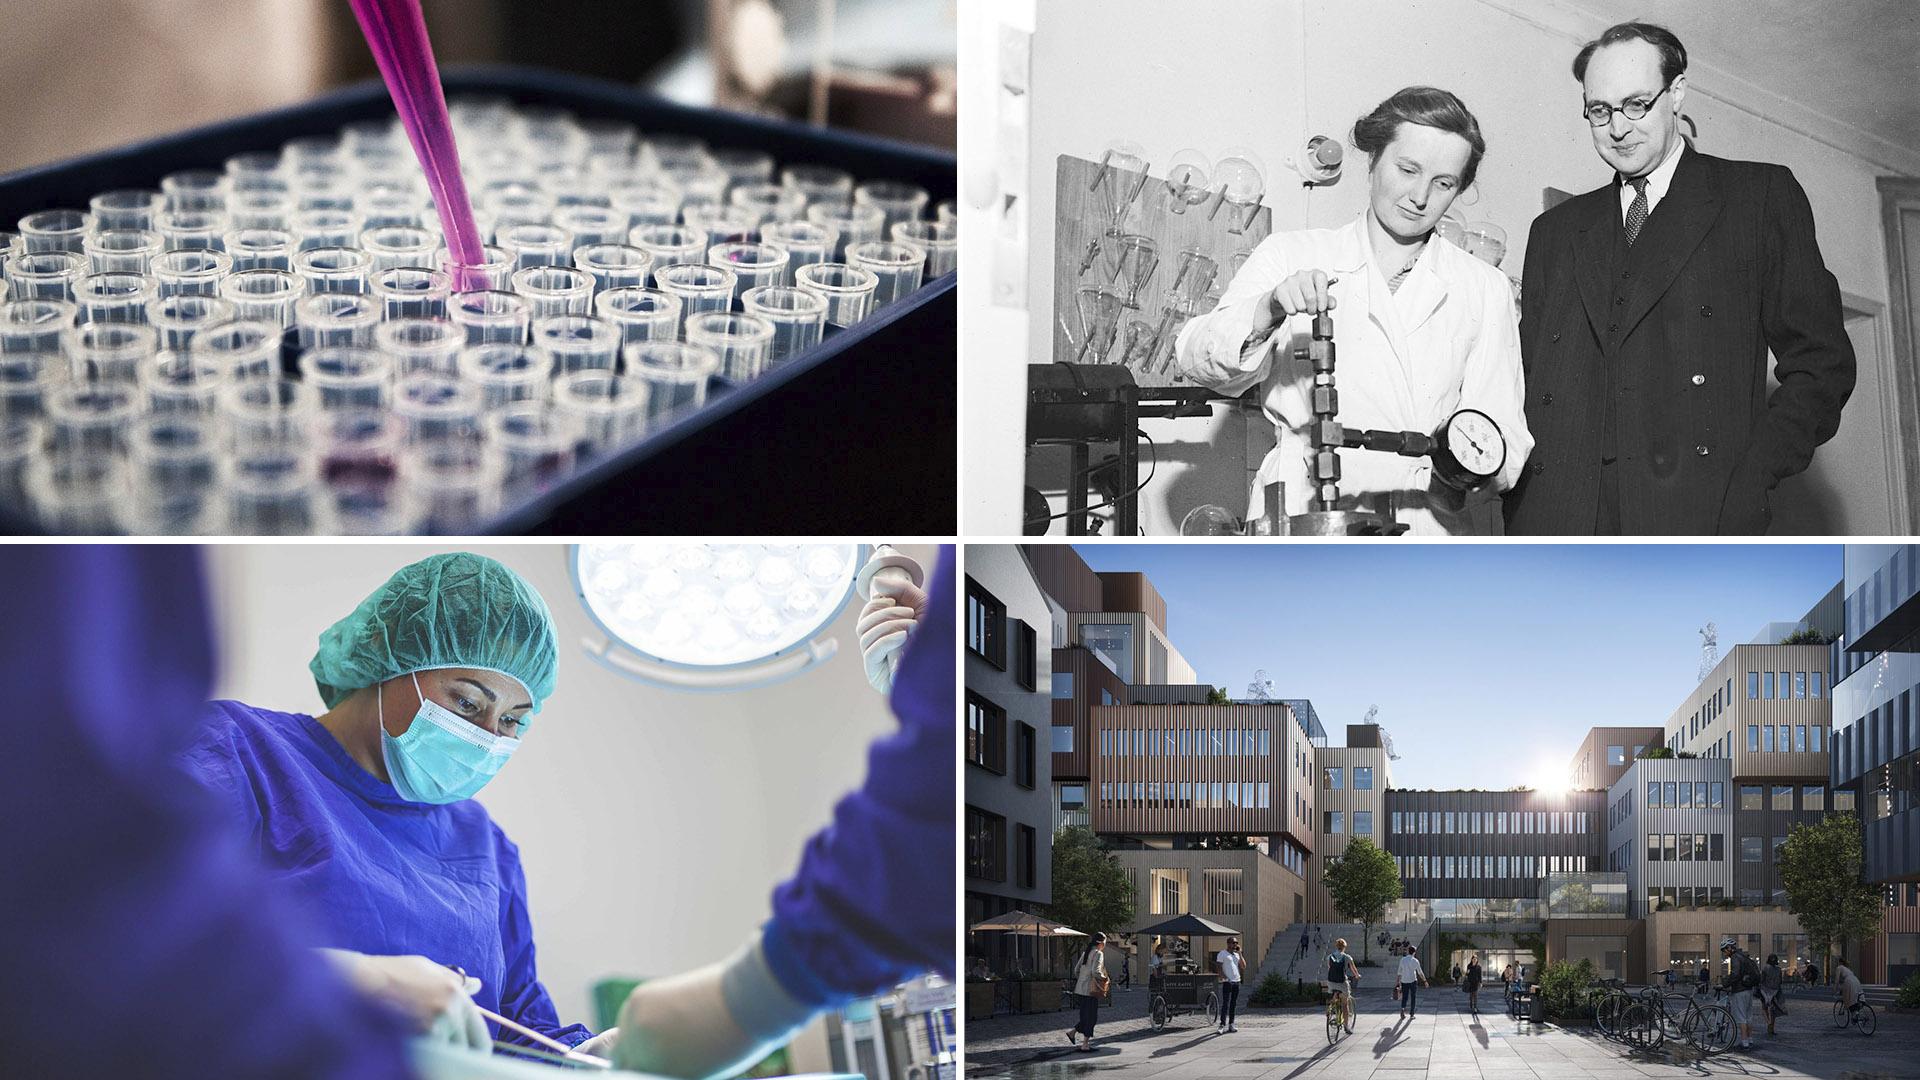 Stina Stenhagen kollage - Life Science